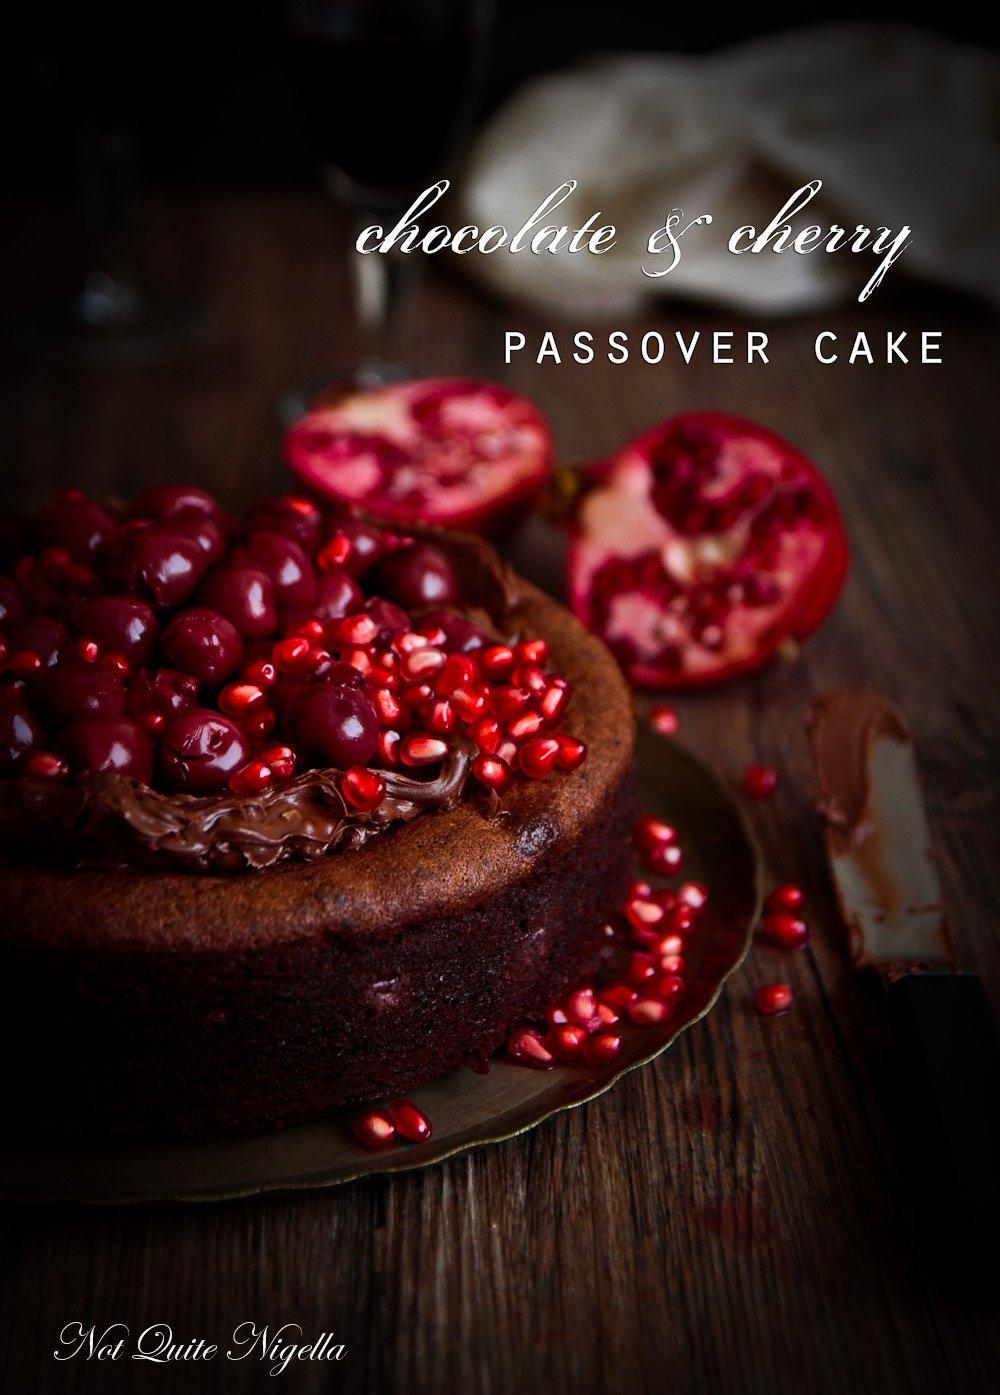 Flourless Chocolate Cherry Cake Passover